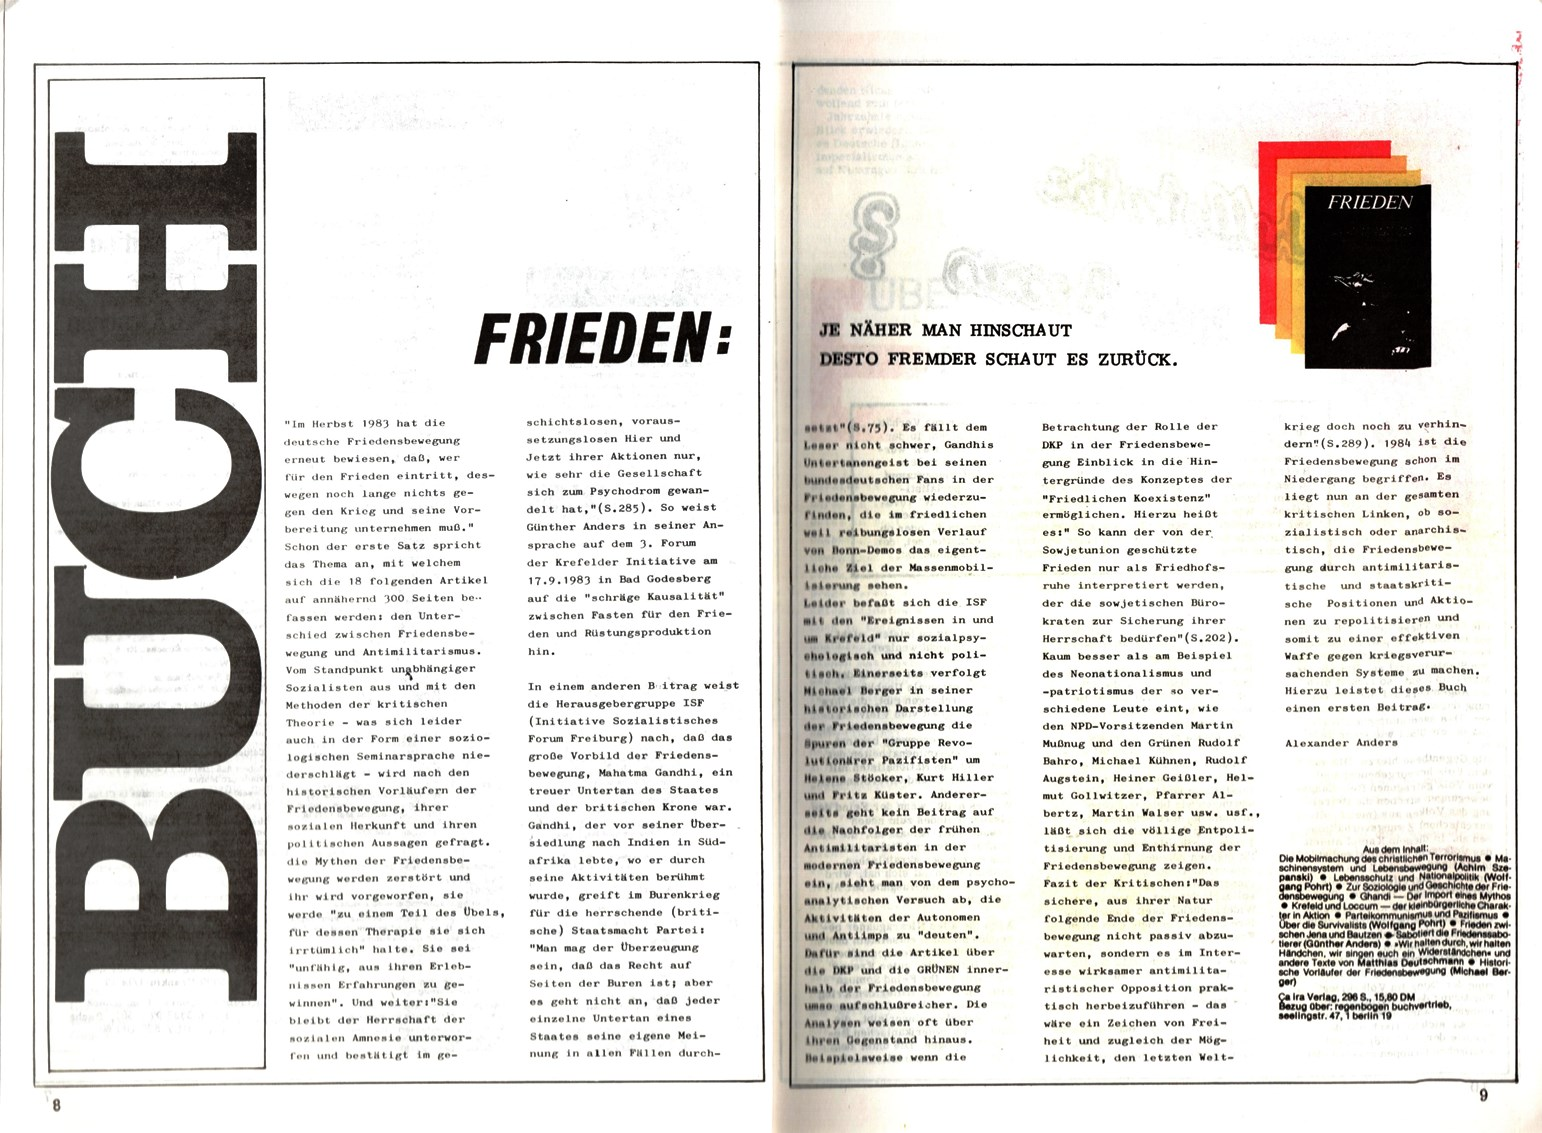 Frankfurt_Aktion_19850200_002_005